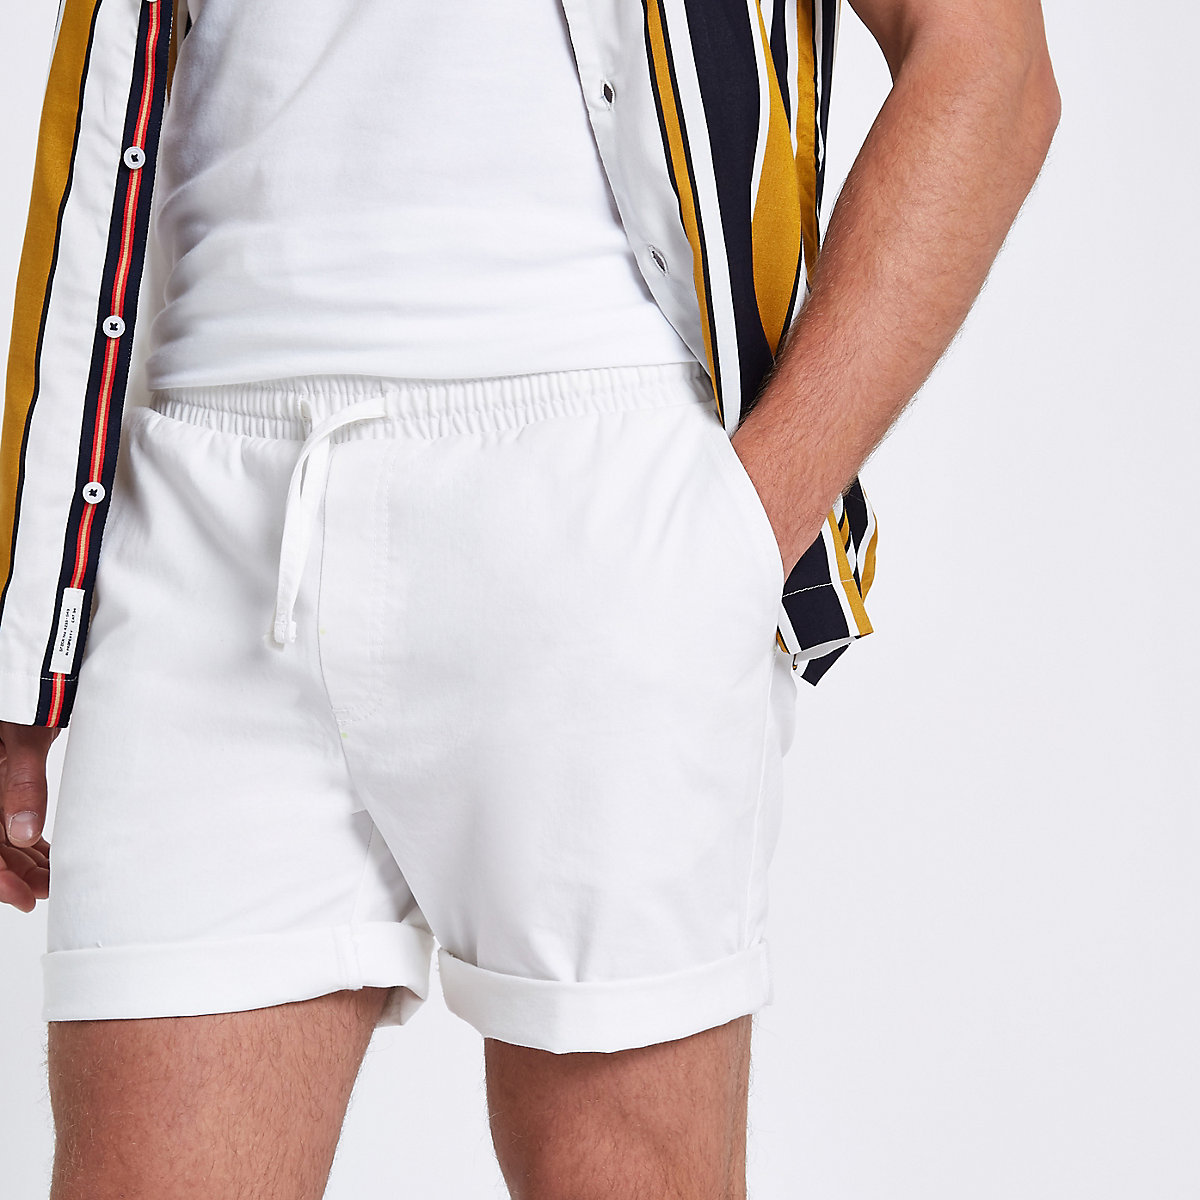 White drawstring pull on shorts